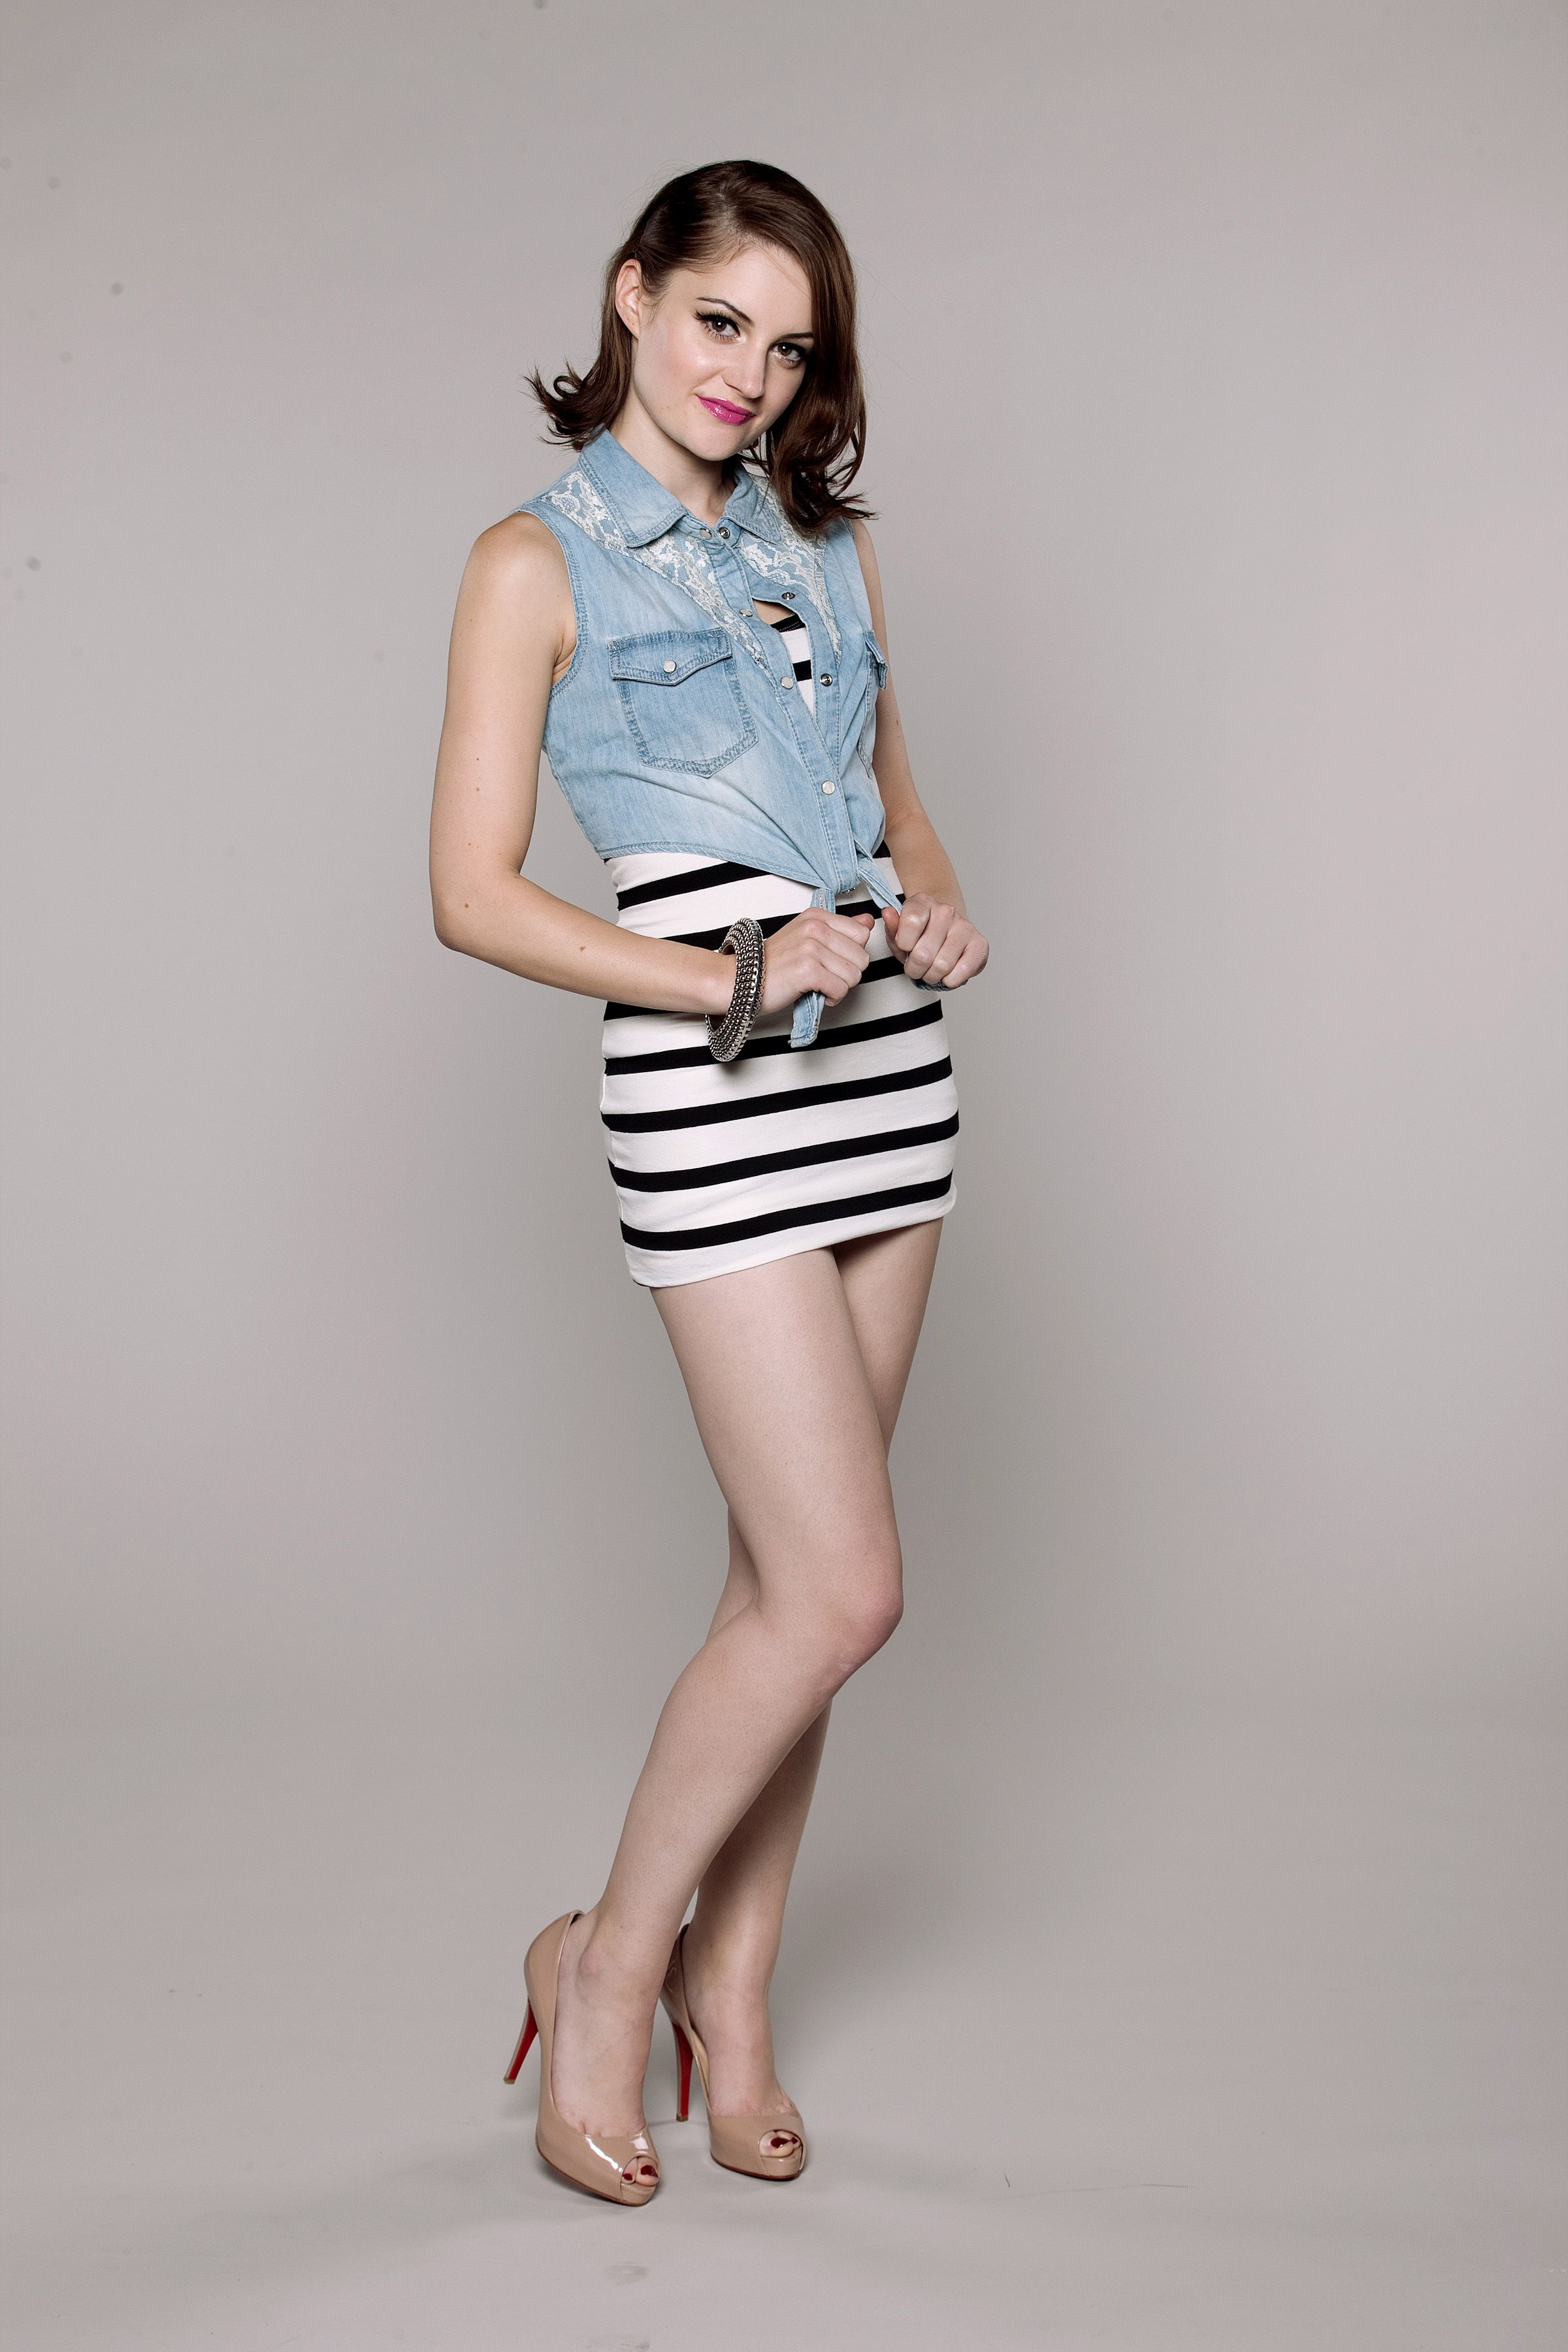 British Model Paula Lane Spike Heels Model Photos Bikini Models Short Skirts